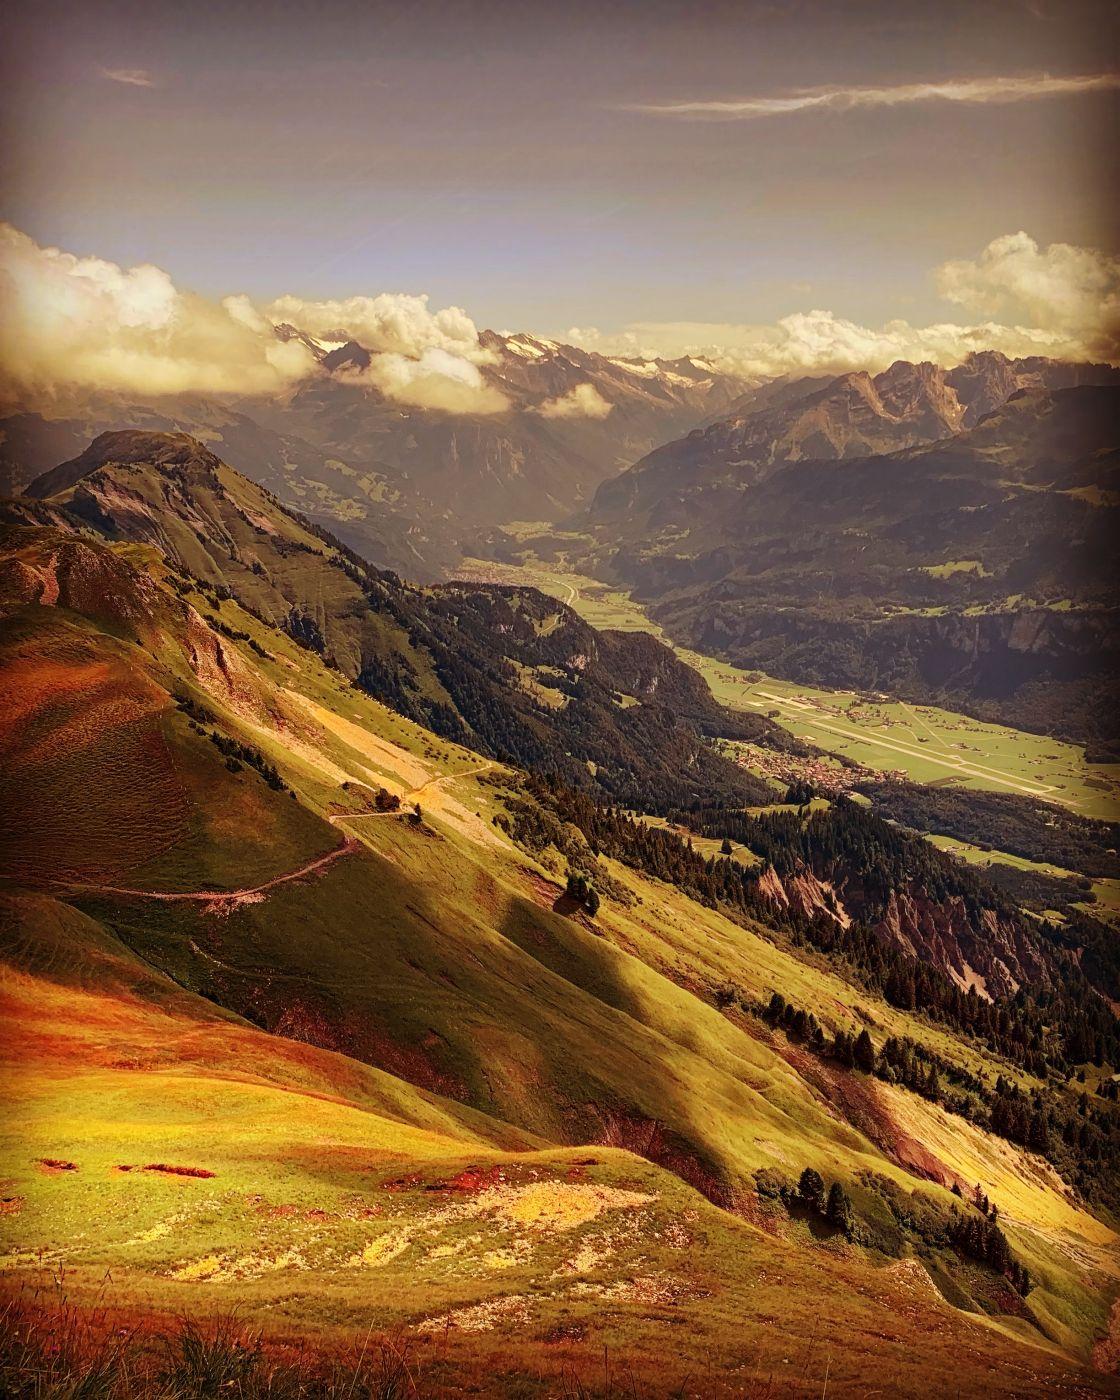 Mountains and Valleys near Rothorn, Switzerland